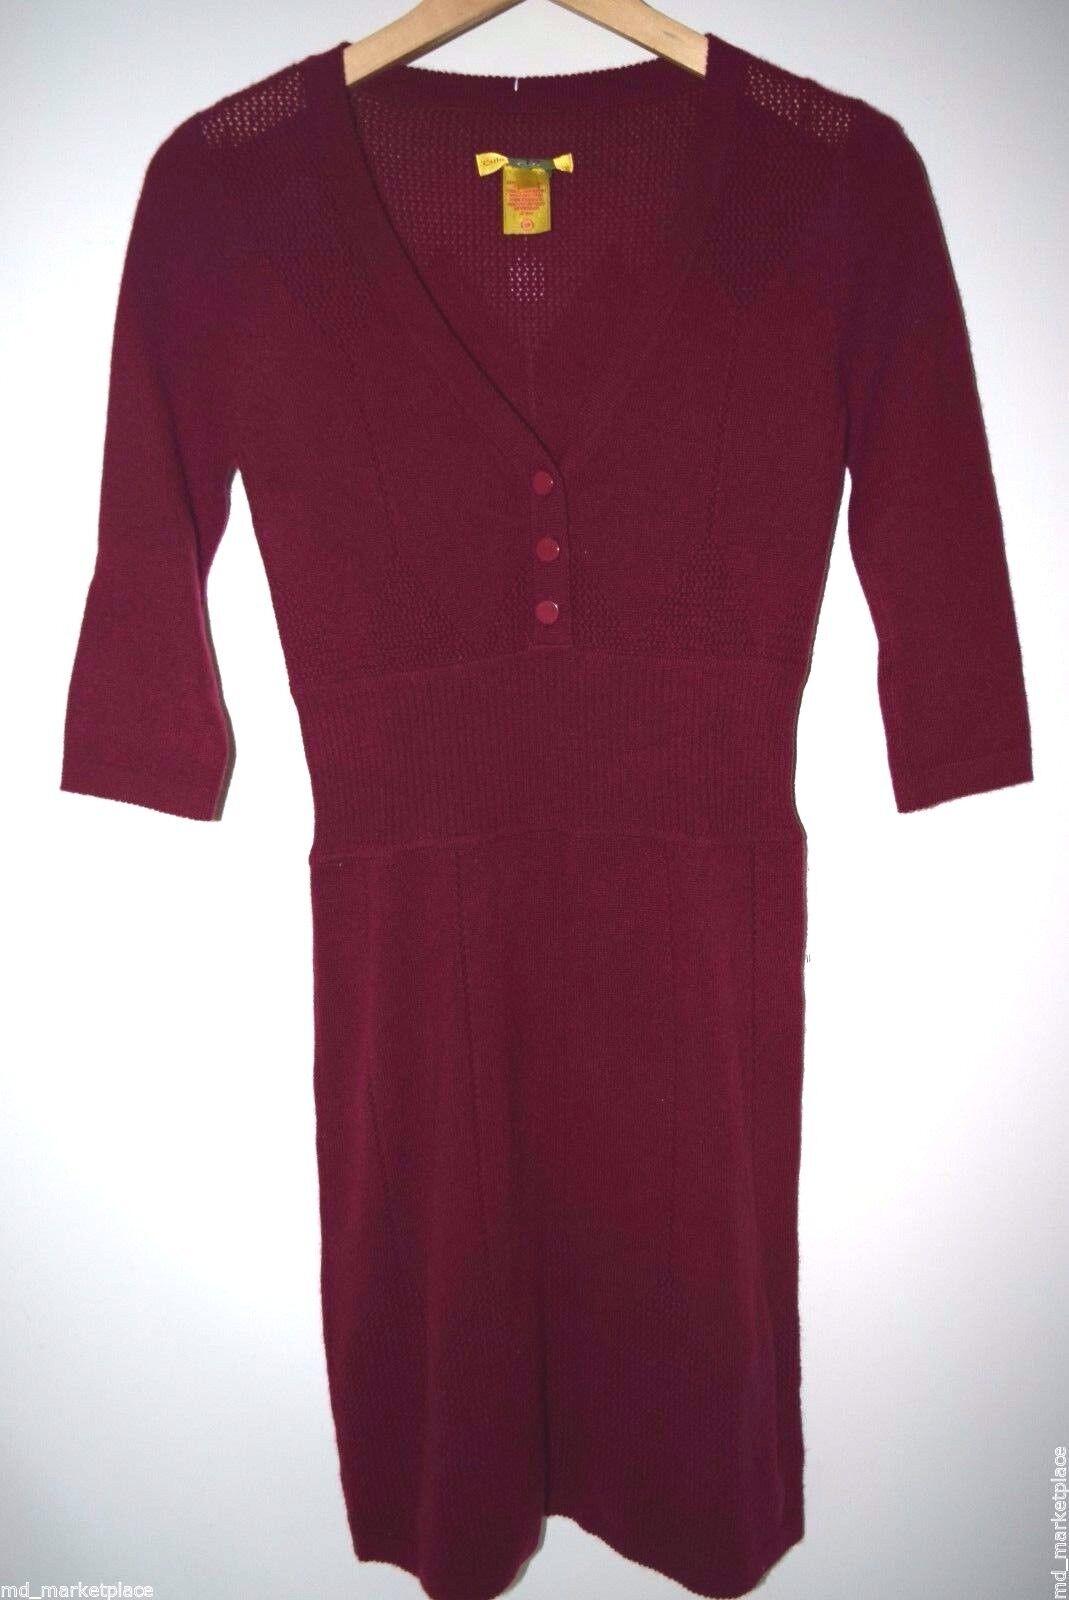 CATHERINE MALANDRINO Stunning Fit Flare Dress 100% CASHMERE Knit Merlot Vneck PS